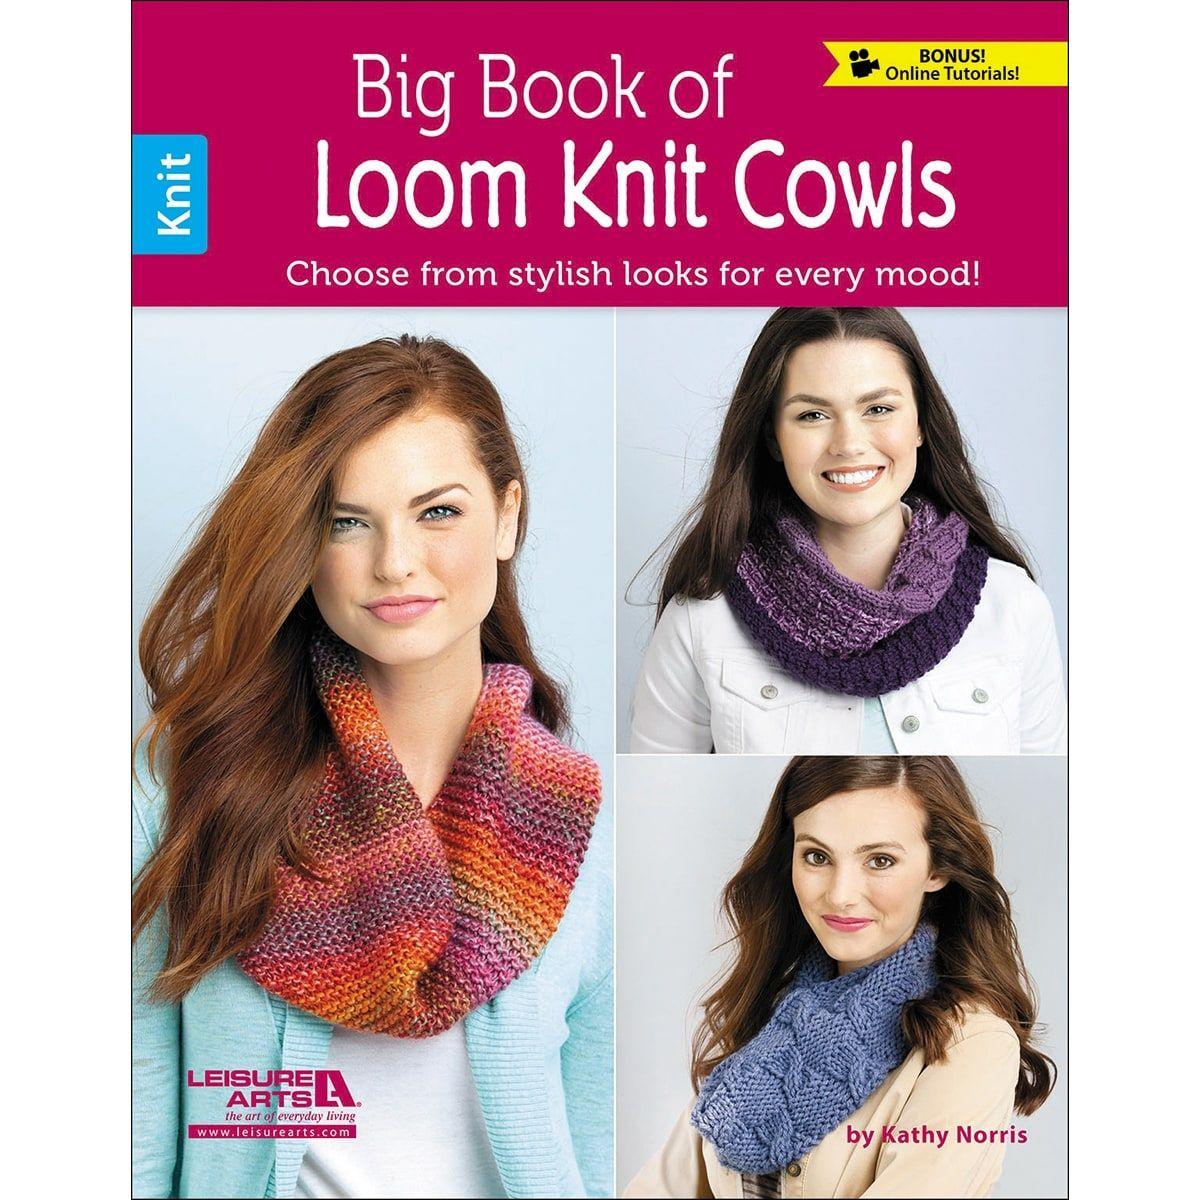 Leisure Arts-Big Book Of Loom Knit Cowls - big book of loom knit ...